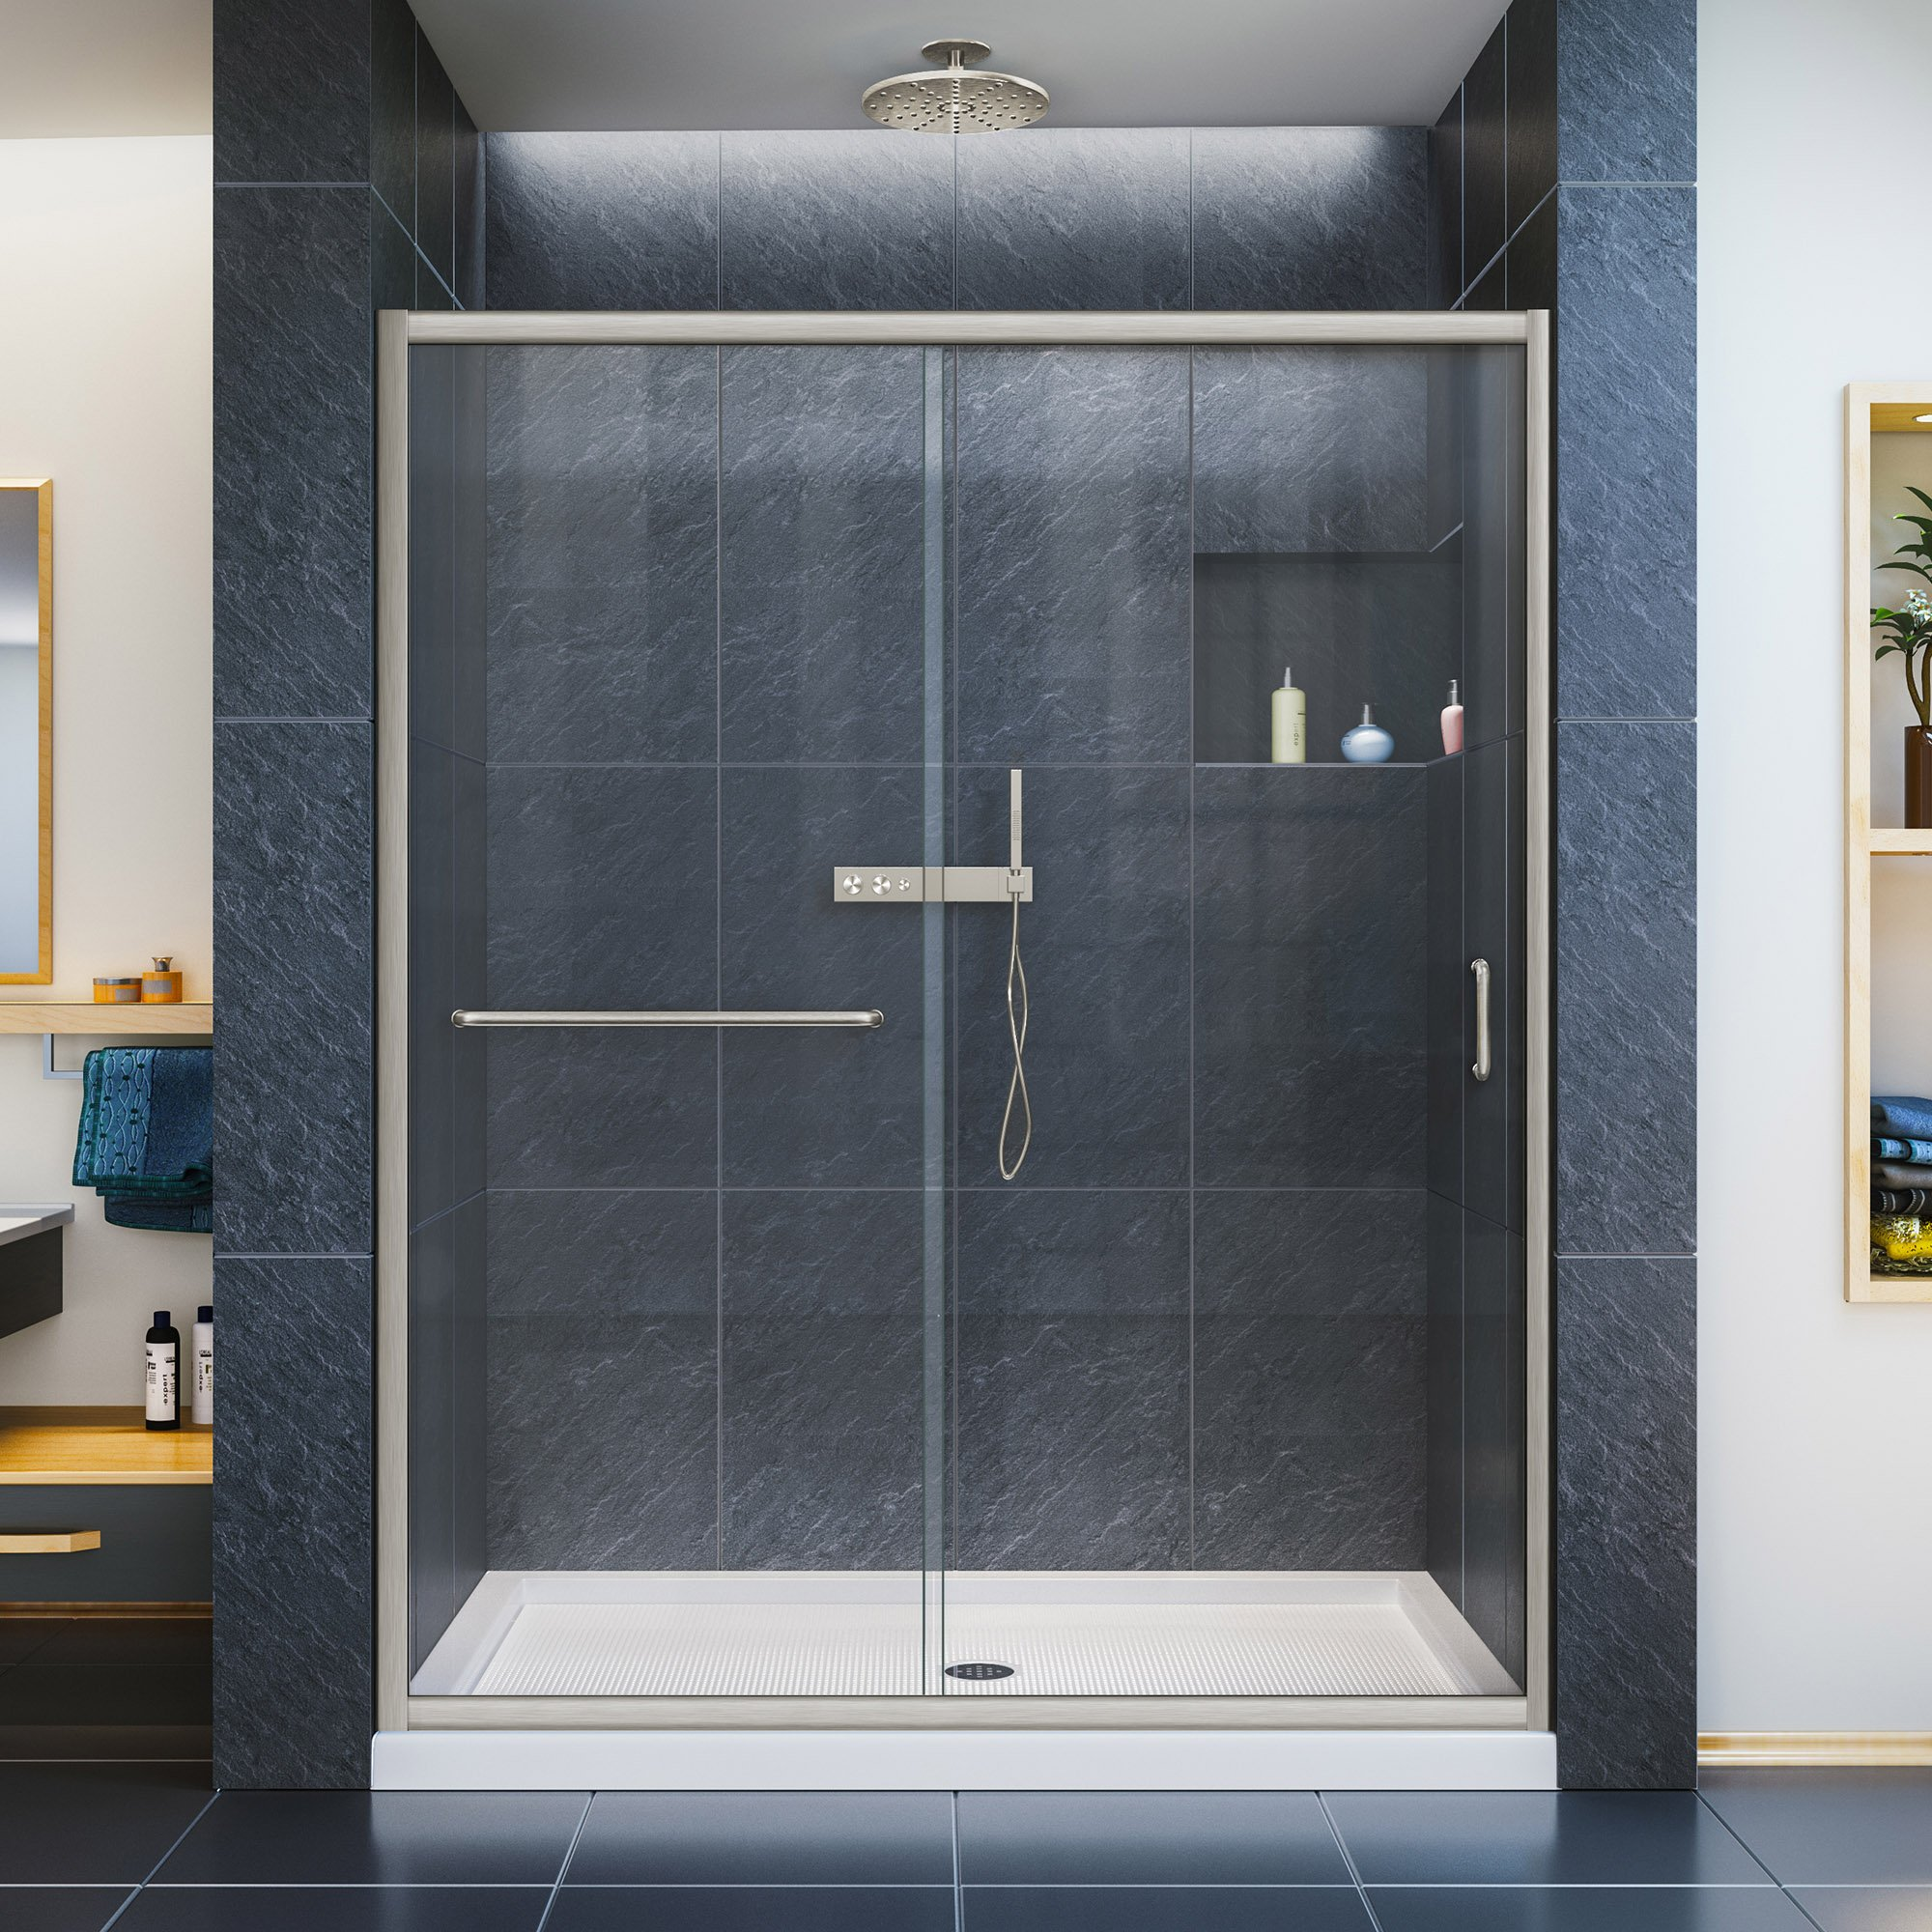 DreamLine Infinity-Z 50-54 in. W x 72 in. H Semi-Frameless Sliding Shower Door, Clear Glass in Brushed Nickel, SHDR-0954720-04 by DreamLine (Image #1)